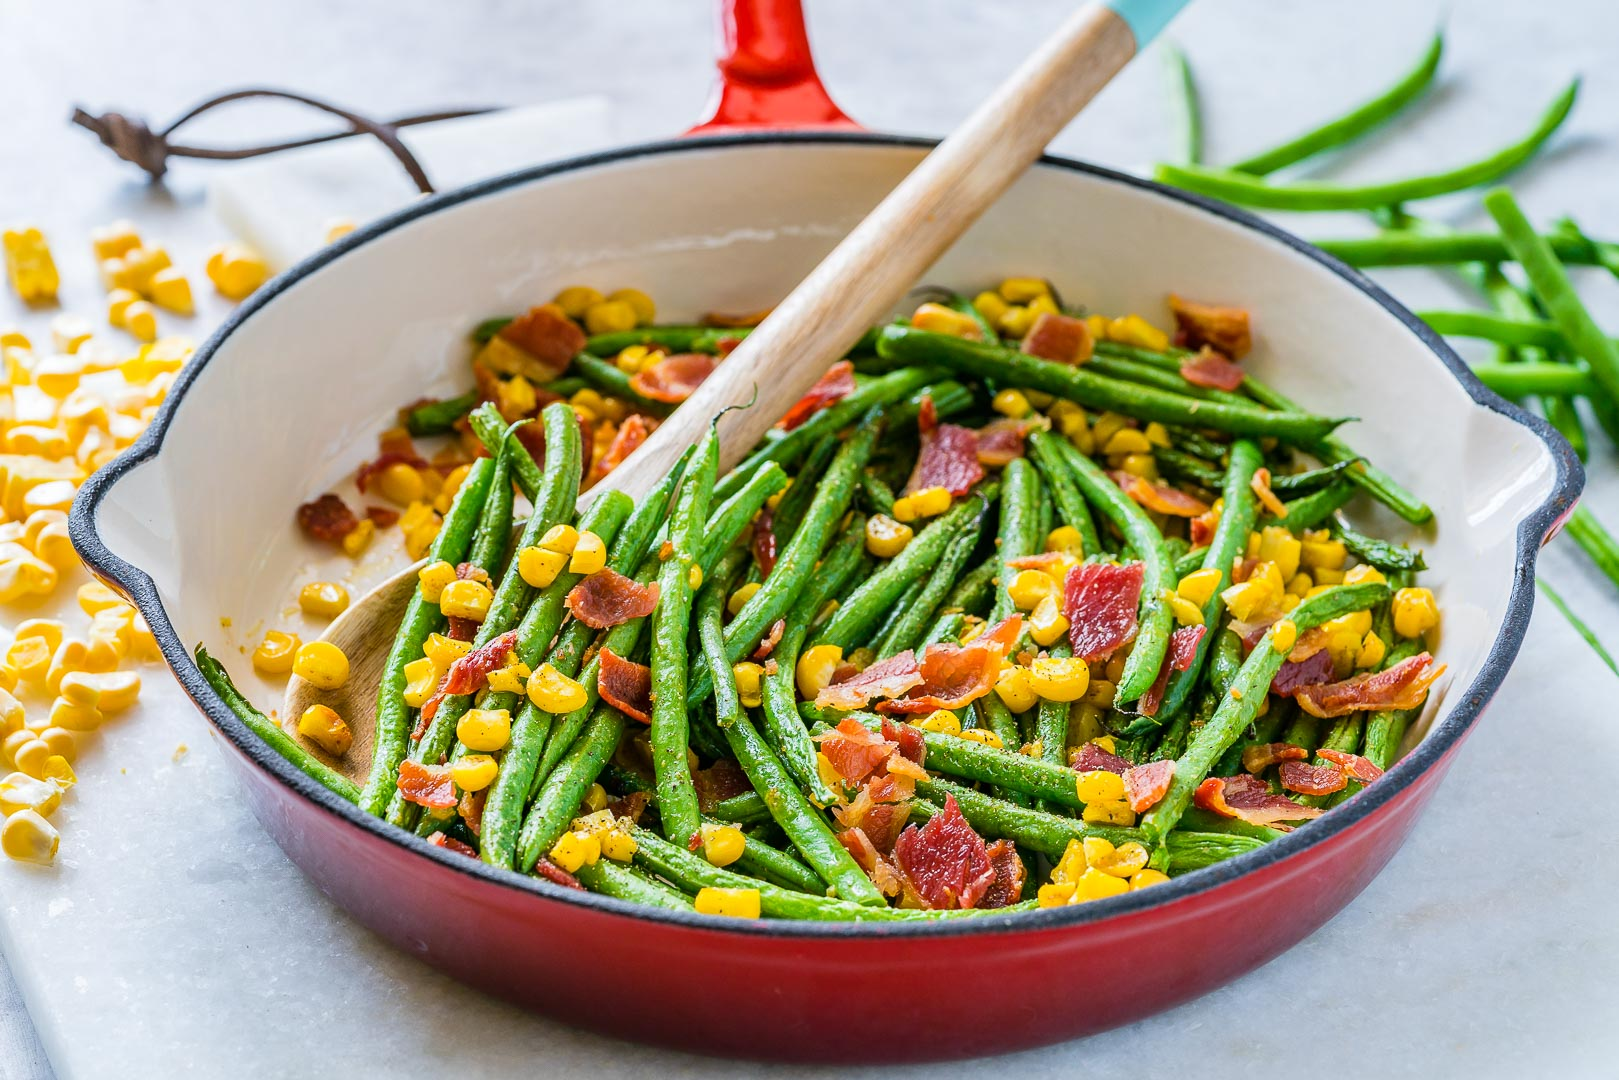 Healthy Green Bean + Bacon Skillet Recipe